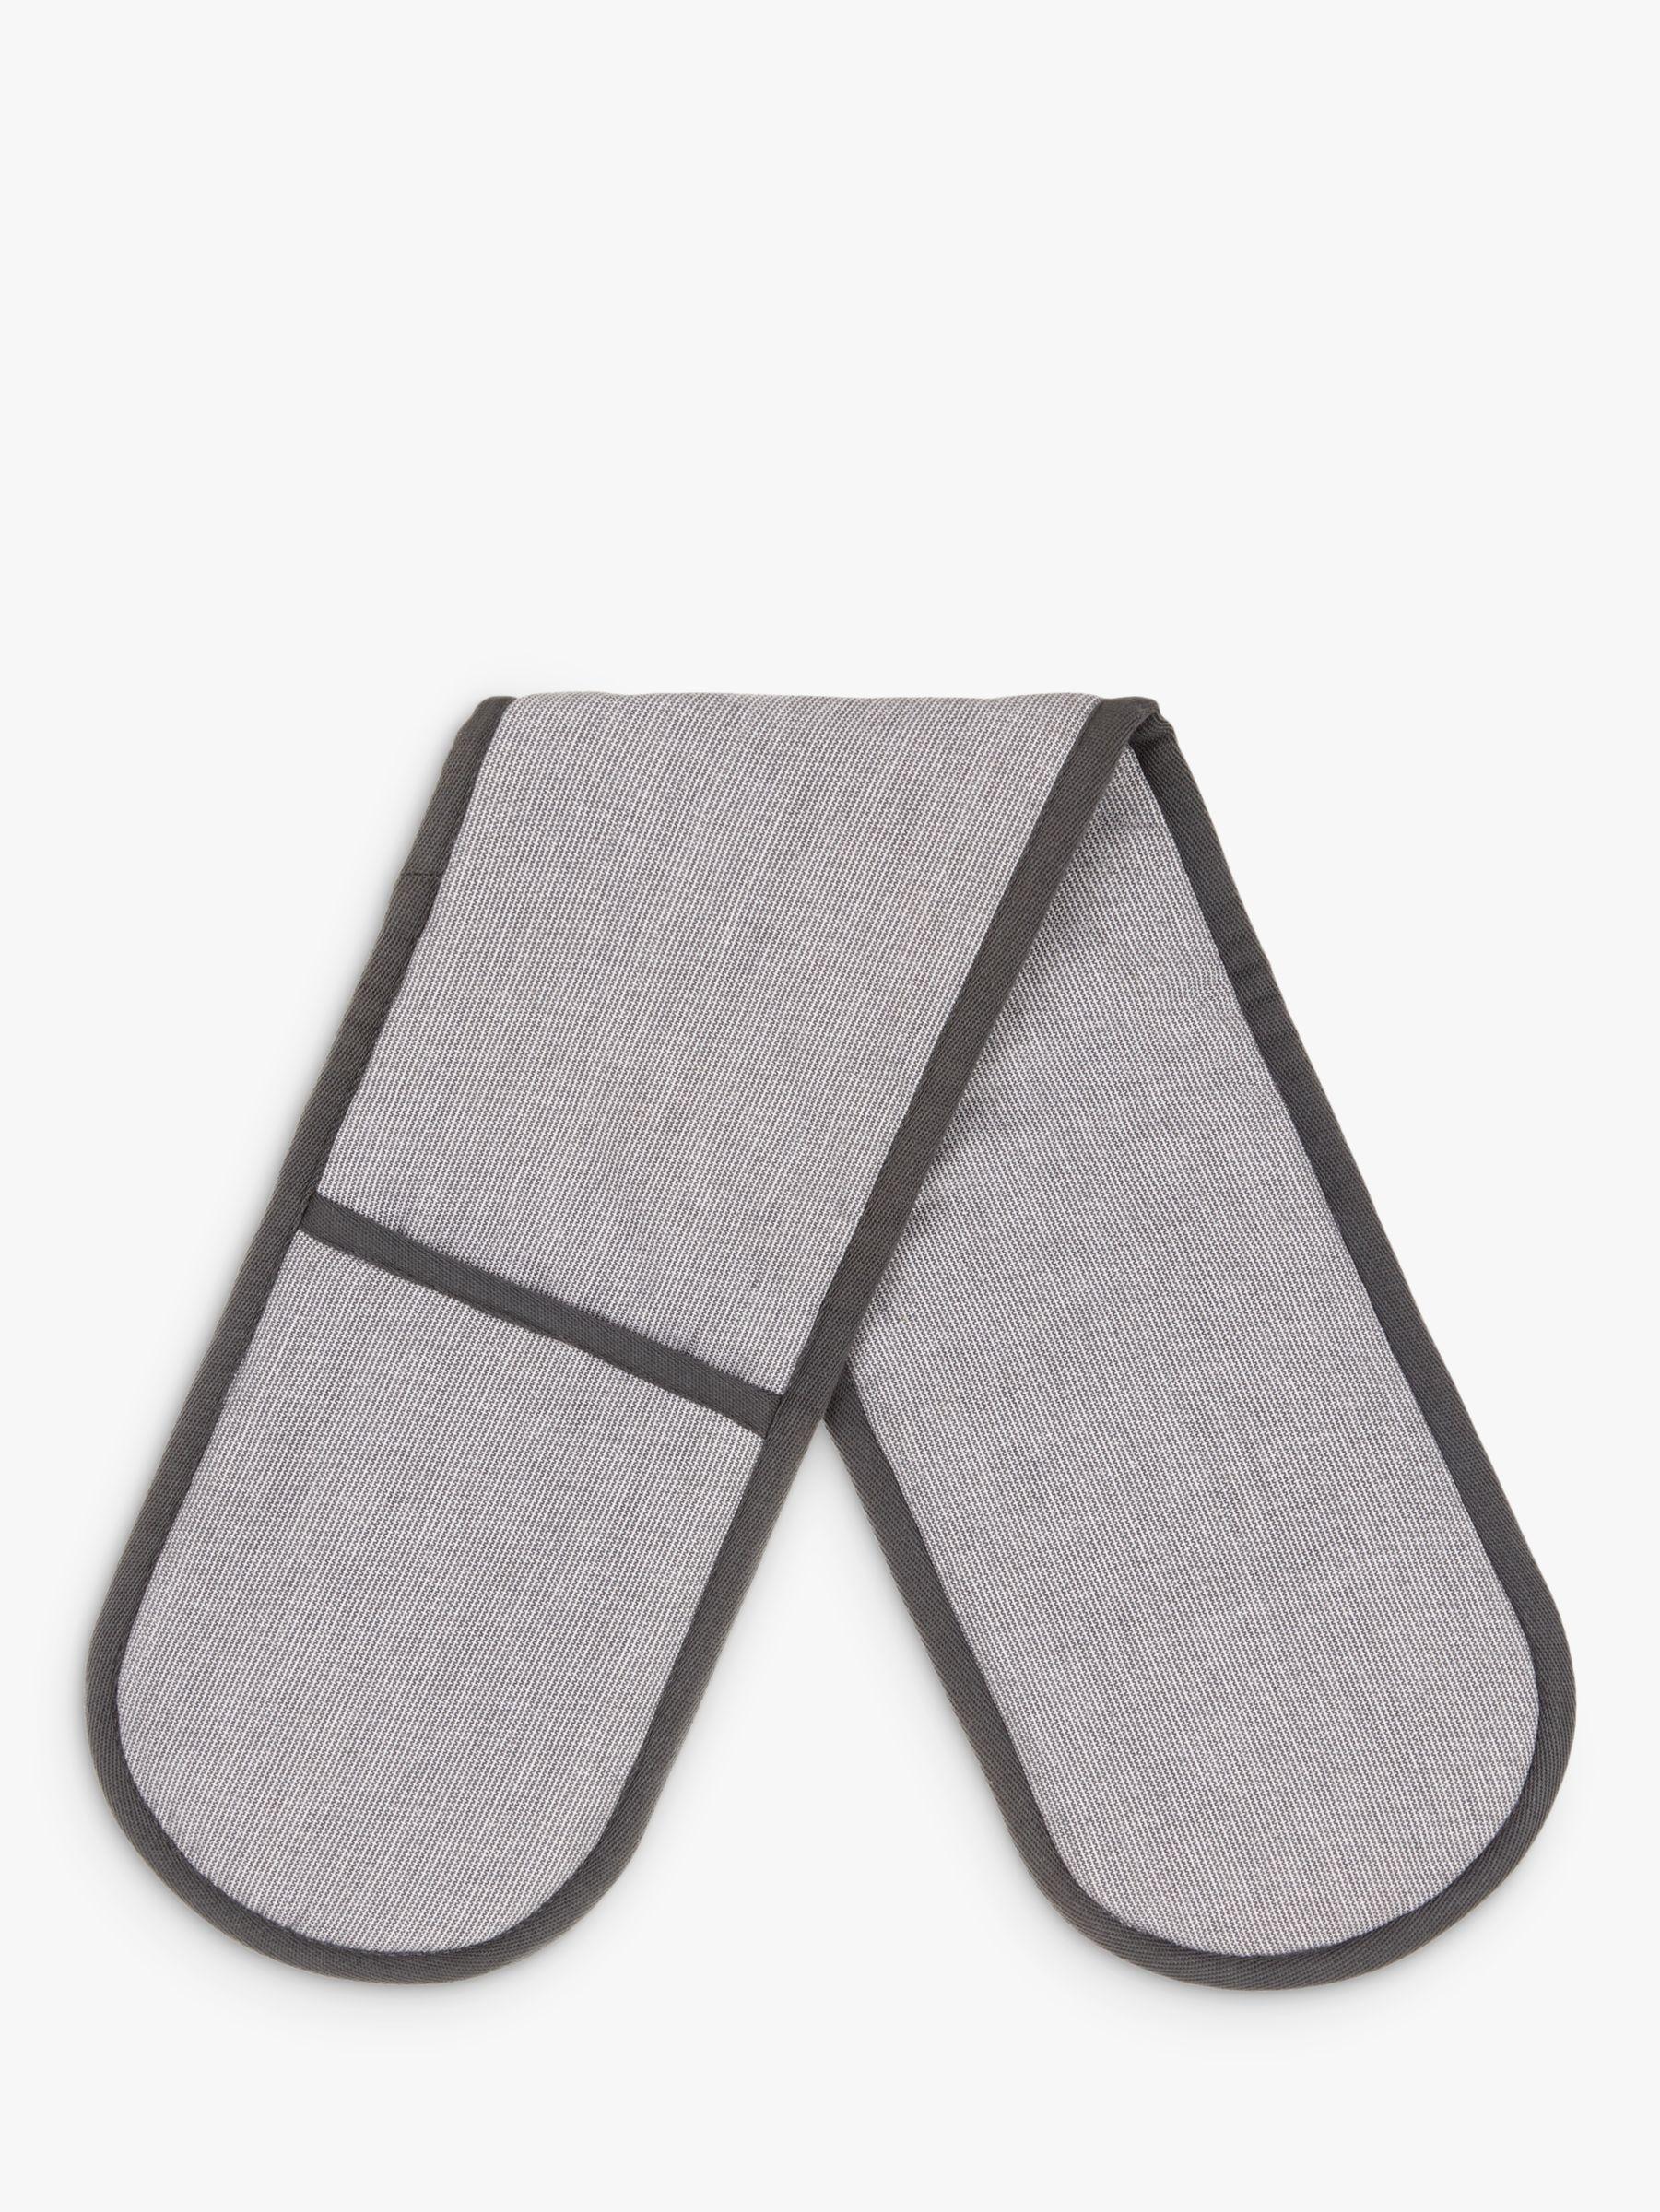 John Lewis & Partners Cotton Double Oven Glove, Steel